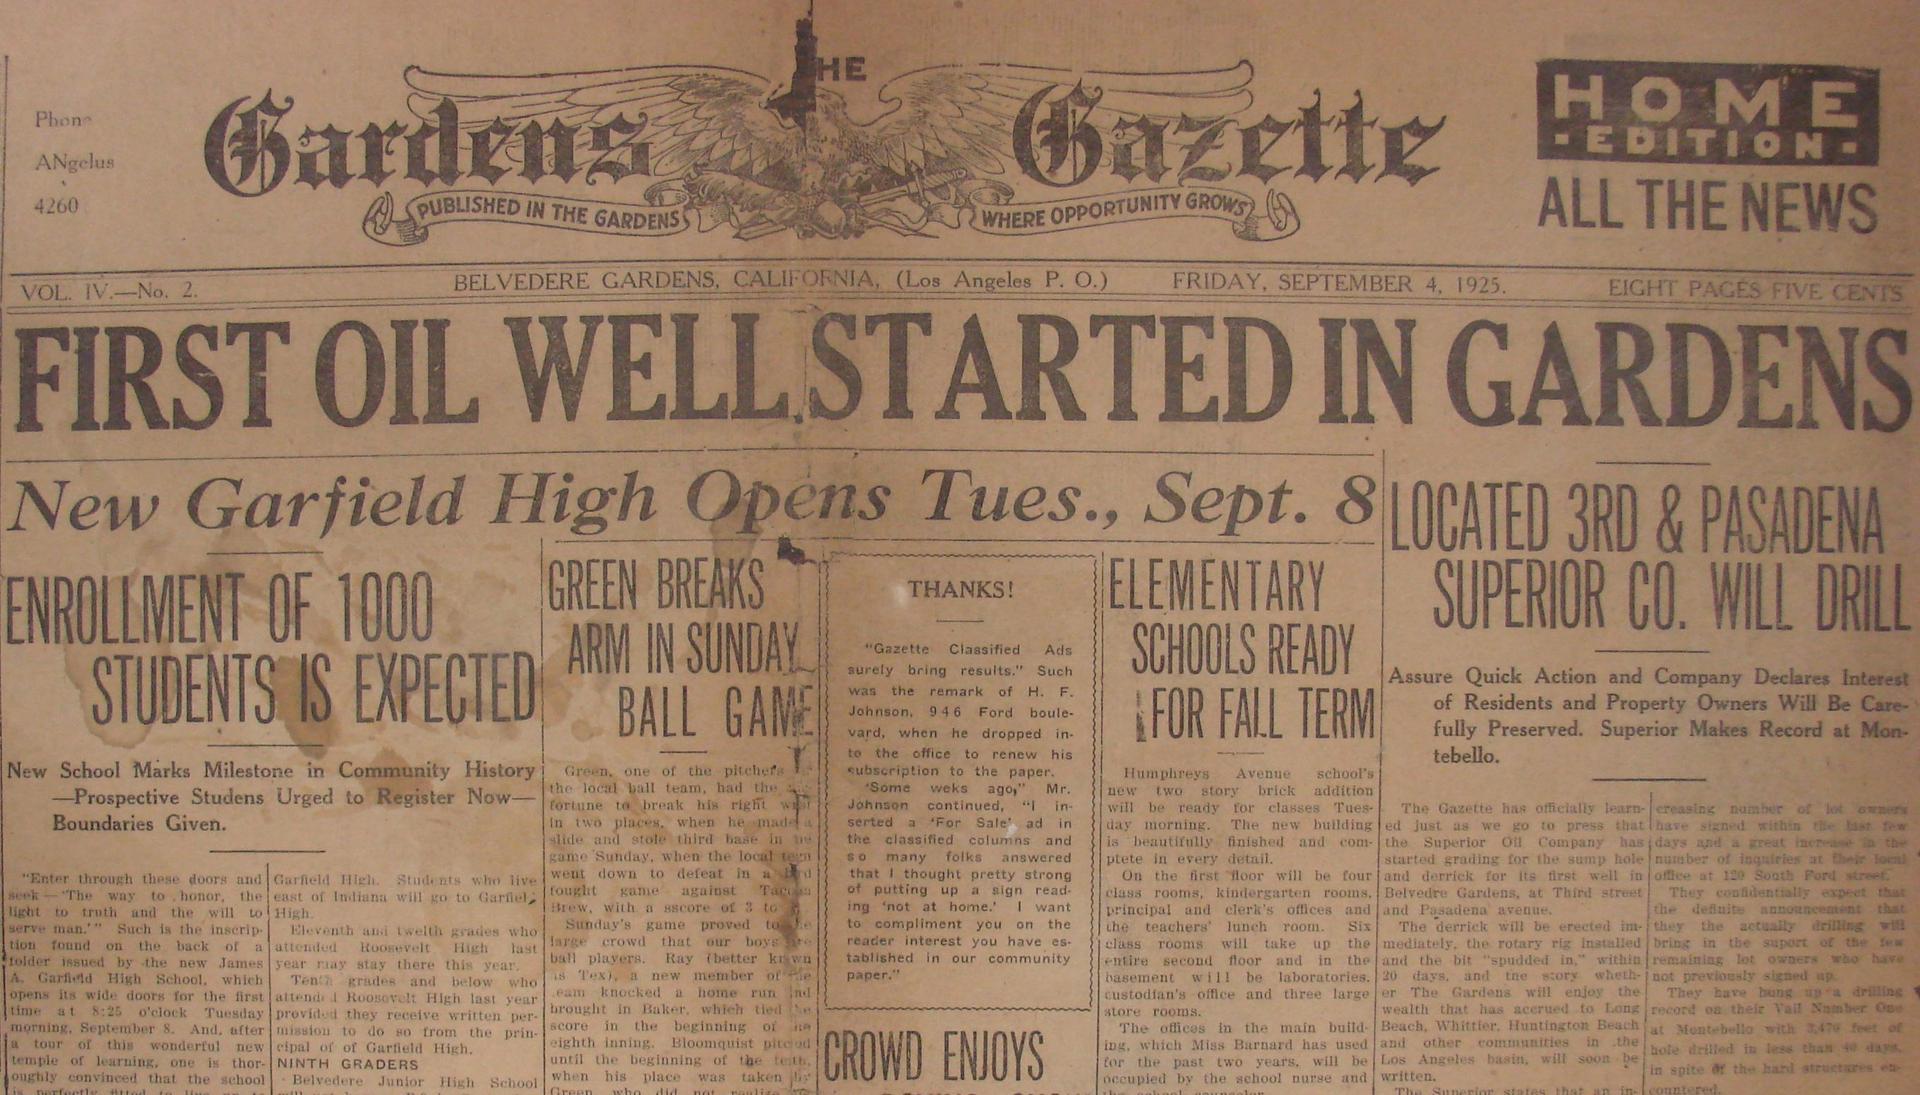 Newspaper Announcing that Garfield High School will open in one week